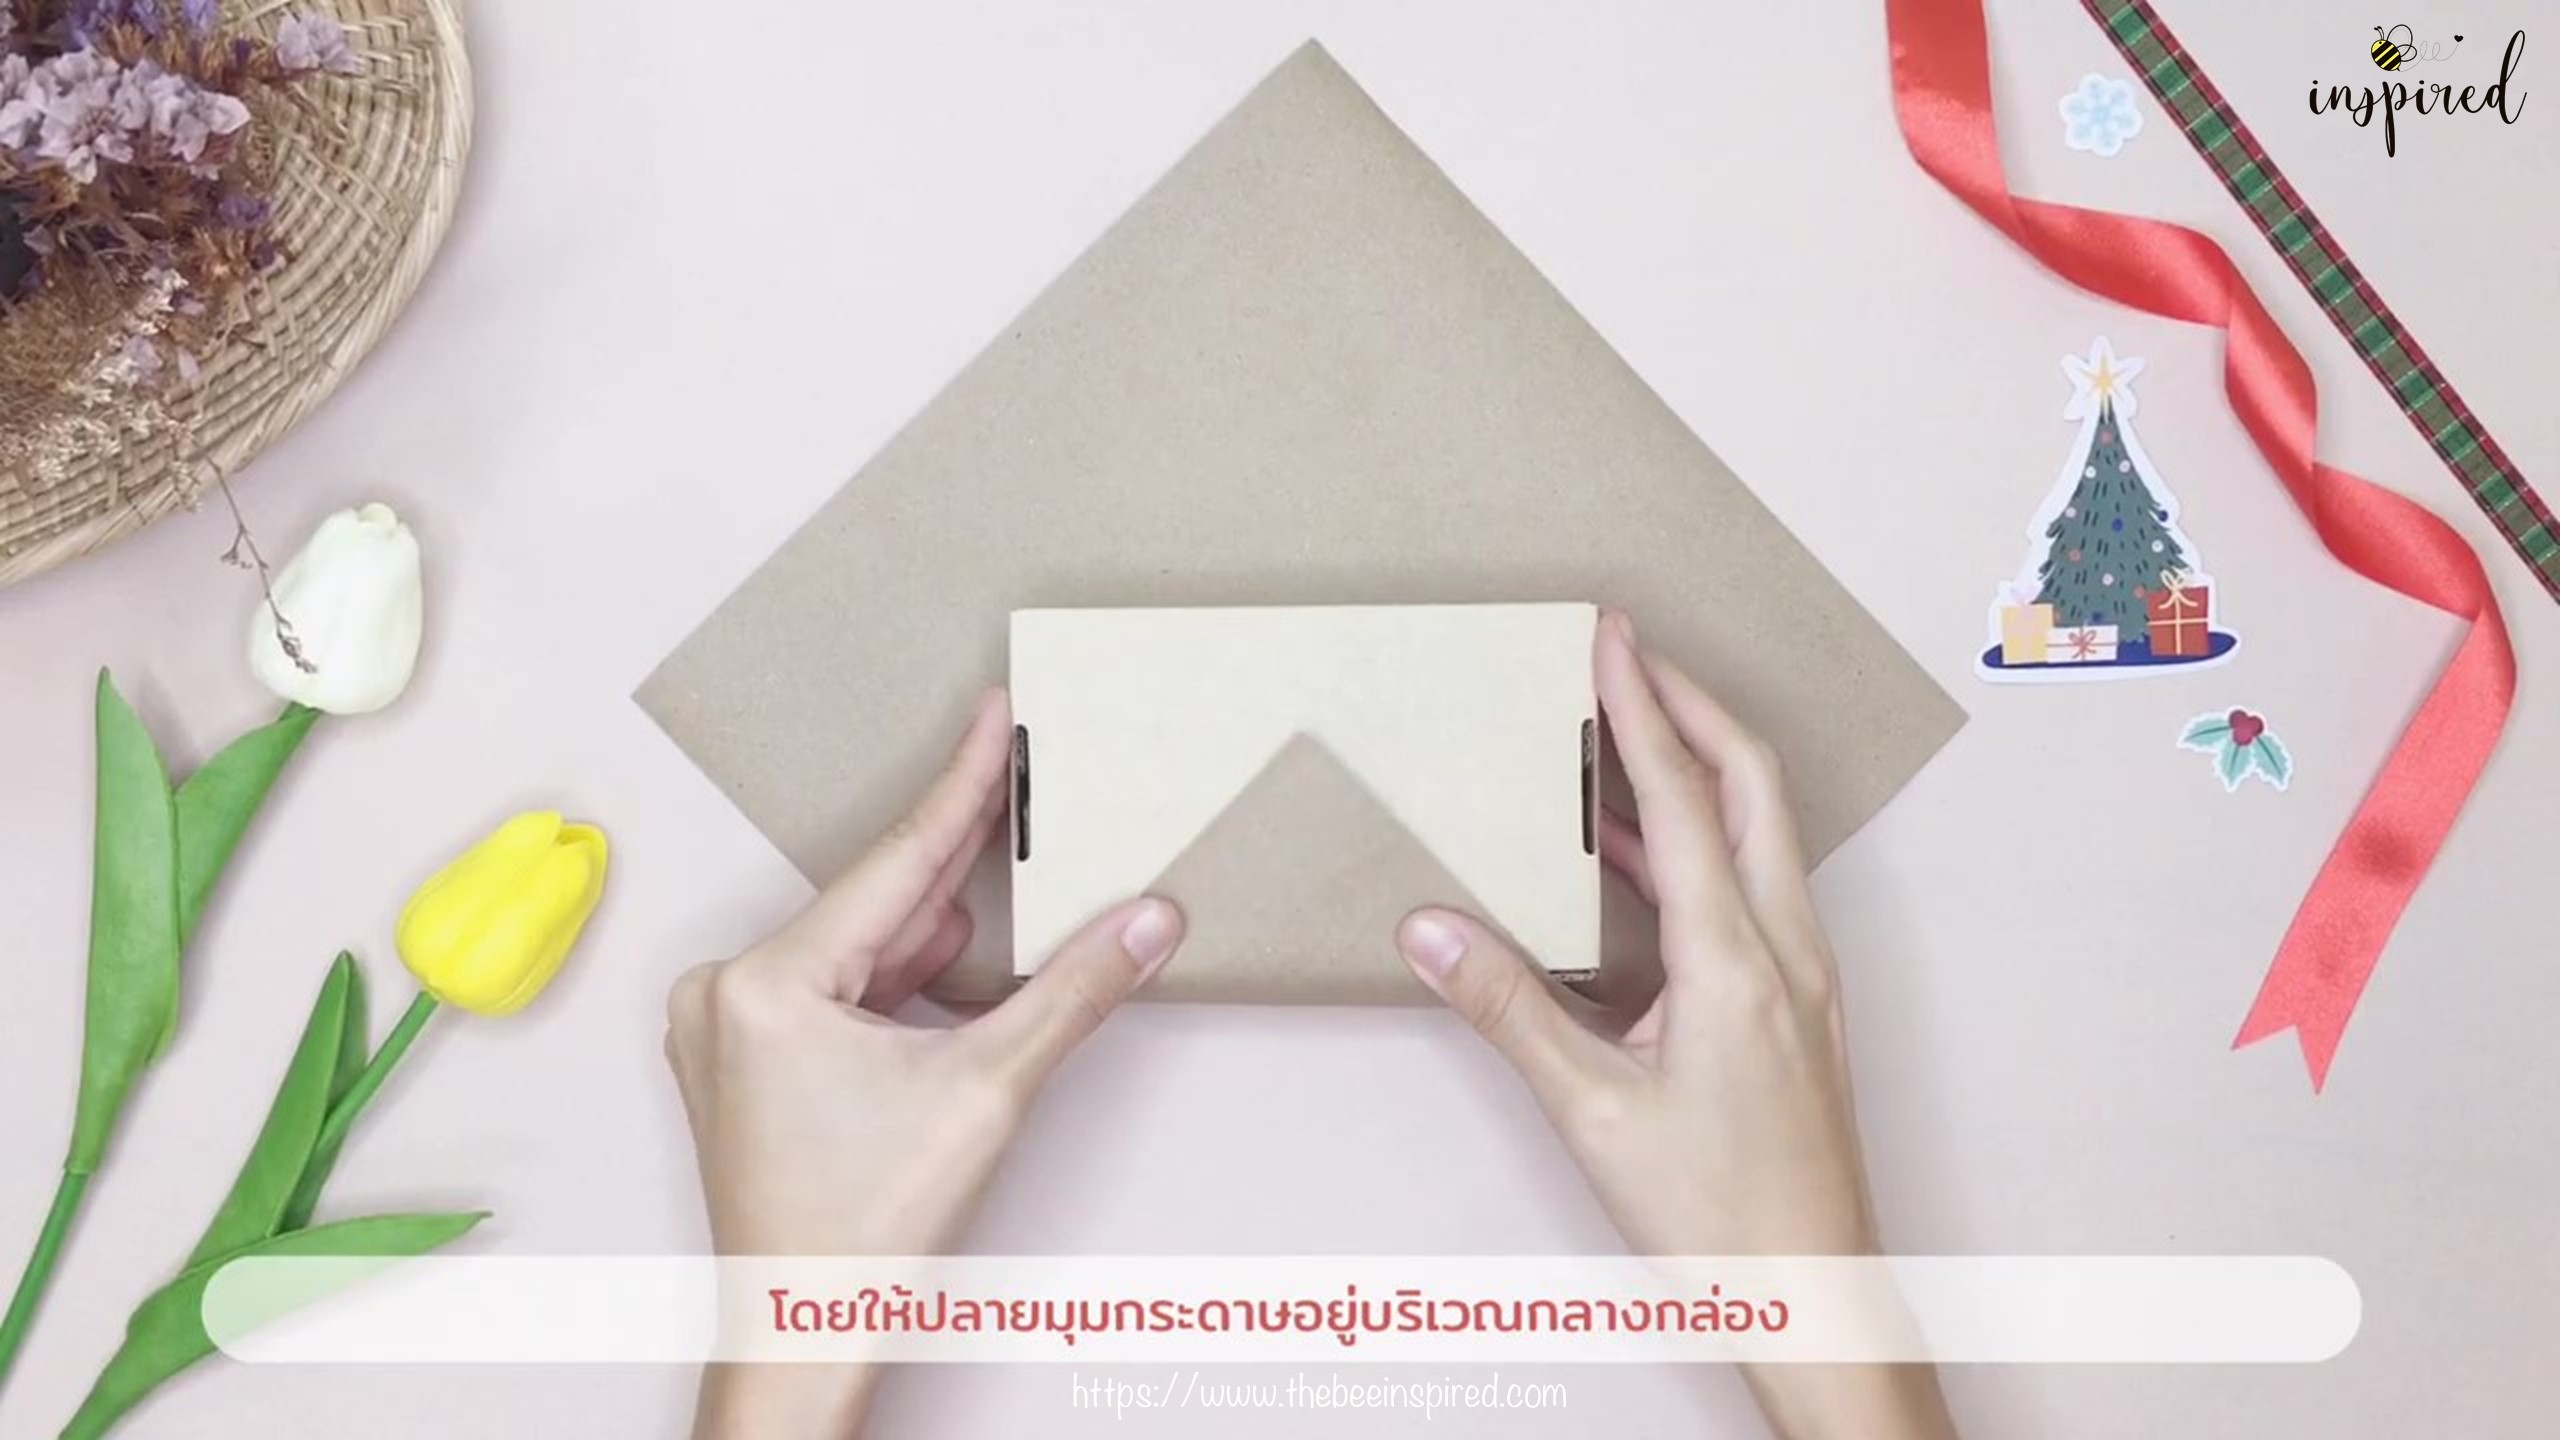 DIY วิธีห่อของขวัญวันวาเลนไทน์ วันปีใหม่ วันคริสมาส & วันเกิด แบบประหยัดกระดาษ_ Gift Wrapping Hack_2